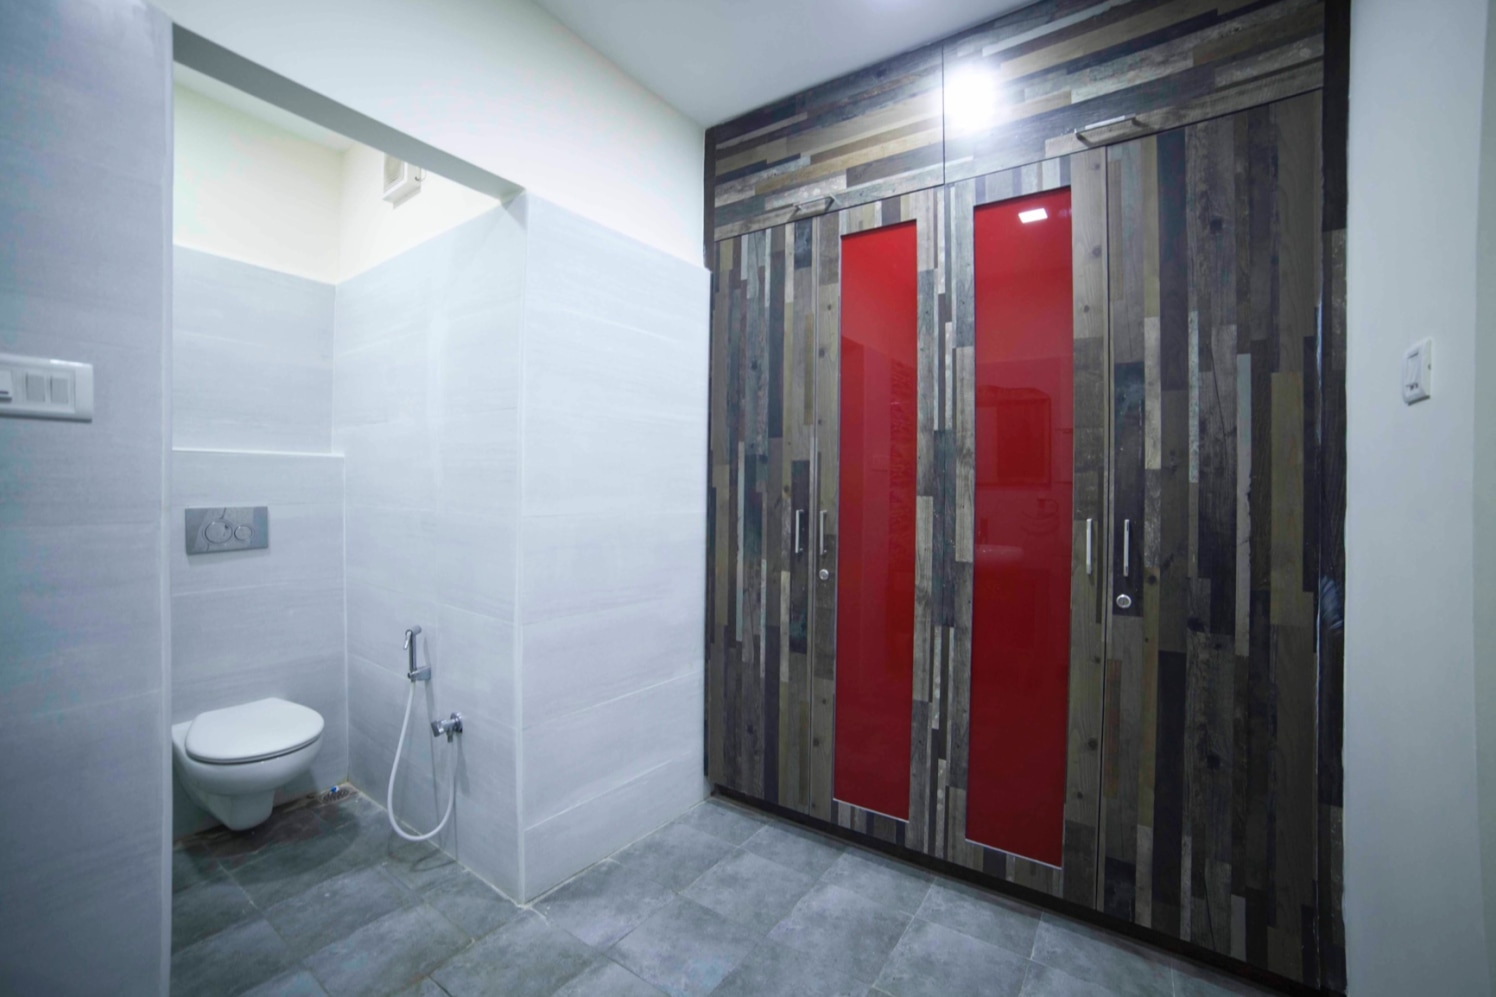 Grey Marble Flooring And White Walls In Bathroom by Sarath Sasi P Bathroom Modern | Interior Design Photos & Ideas